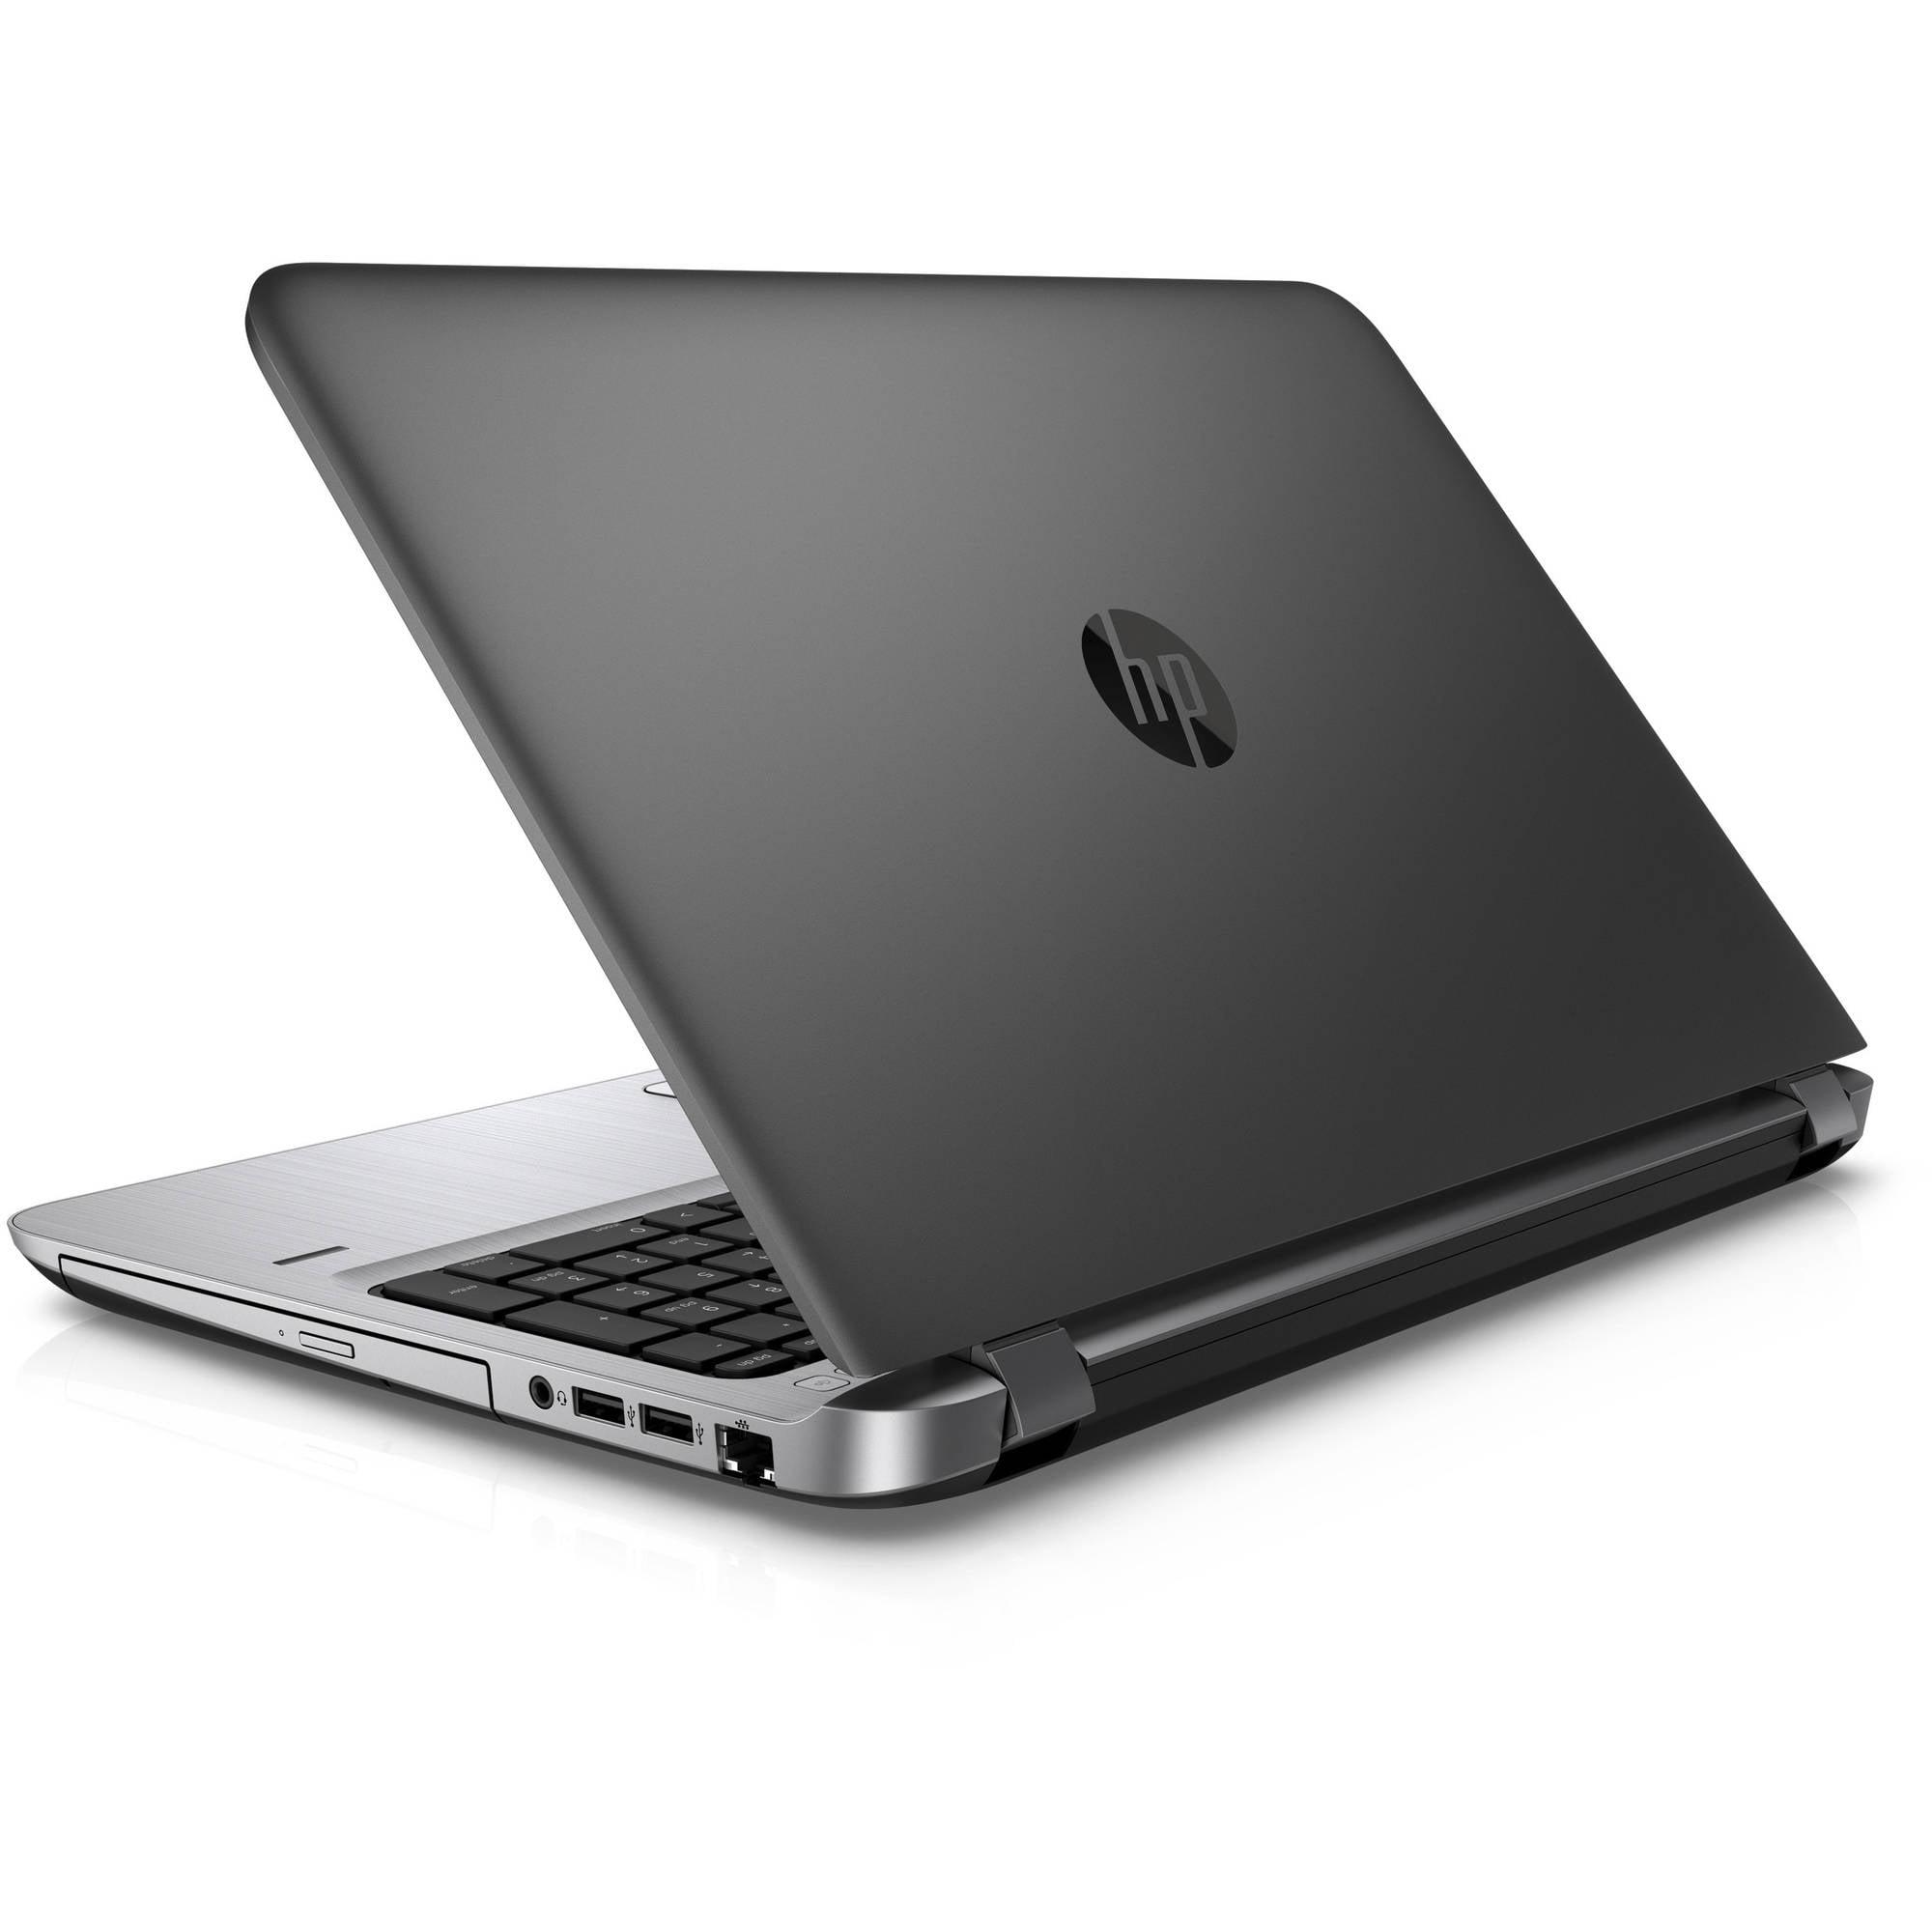 "HP ProBook 450 G3 - 15.6"" - Core i5 6200U - 8 GB RAM - 50..."